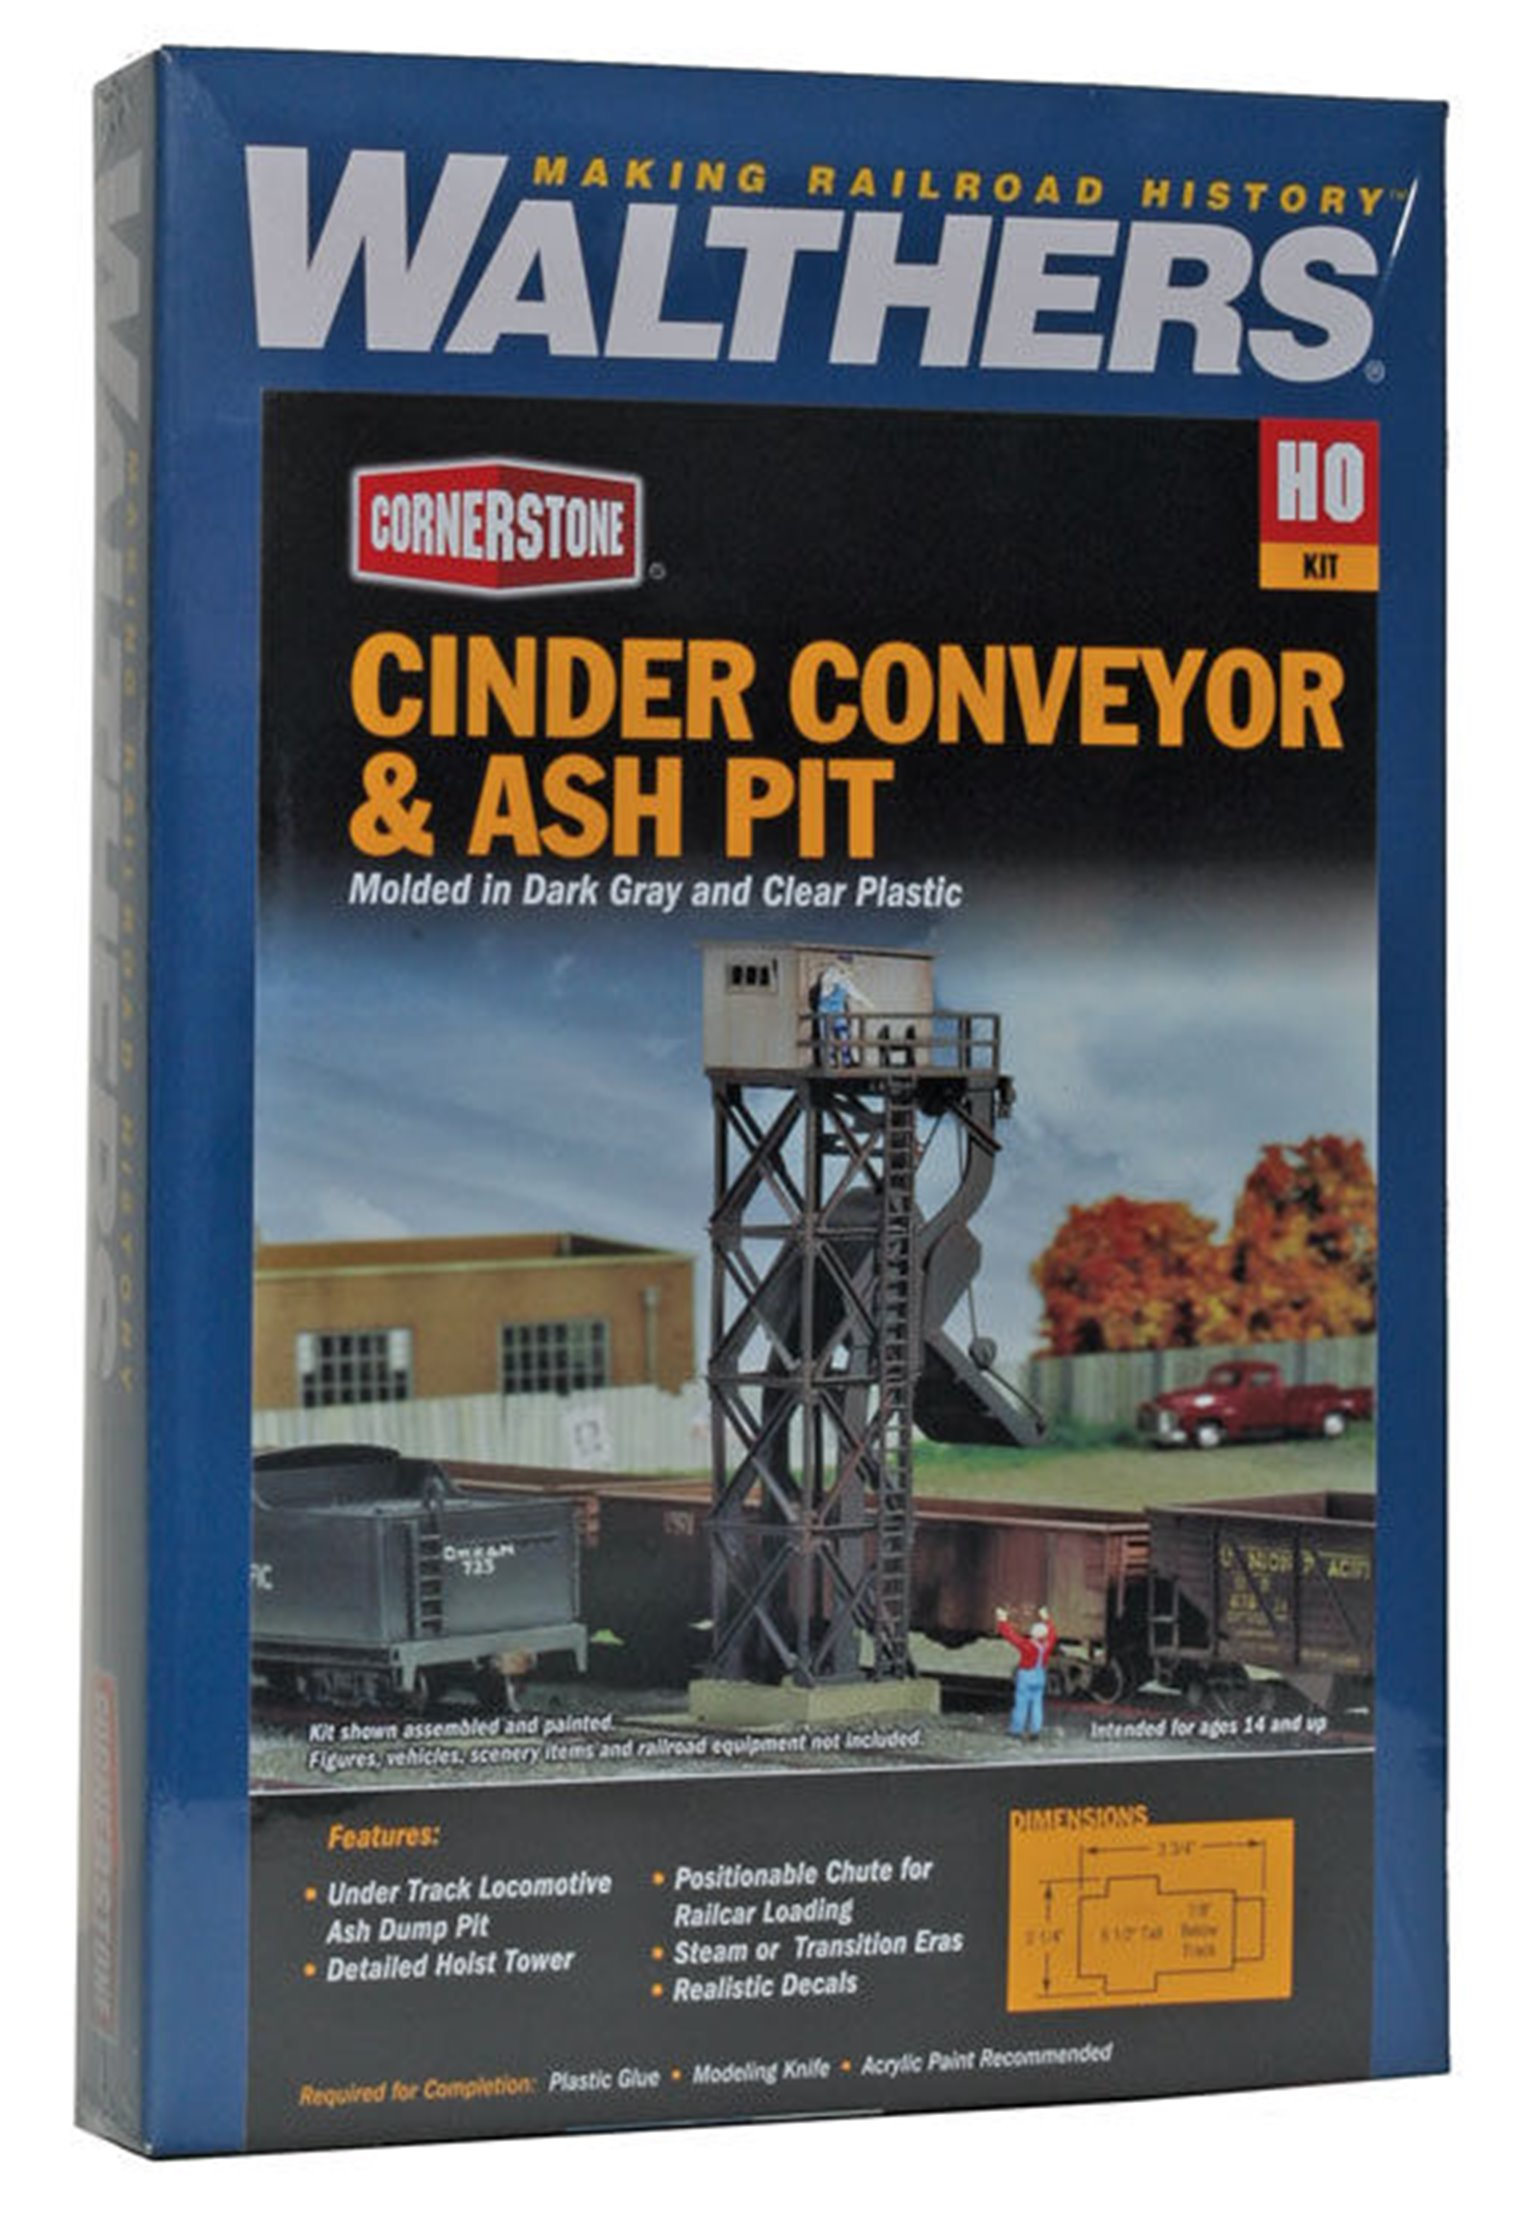 Cinder Conveyor And Ash Pit Kit